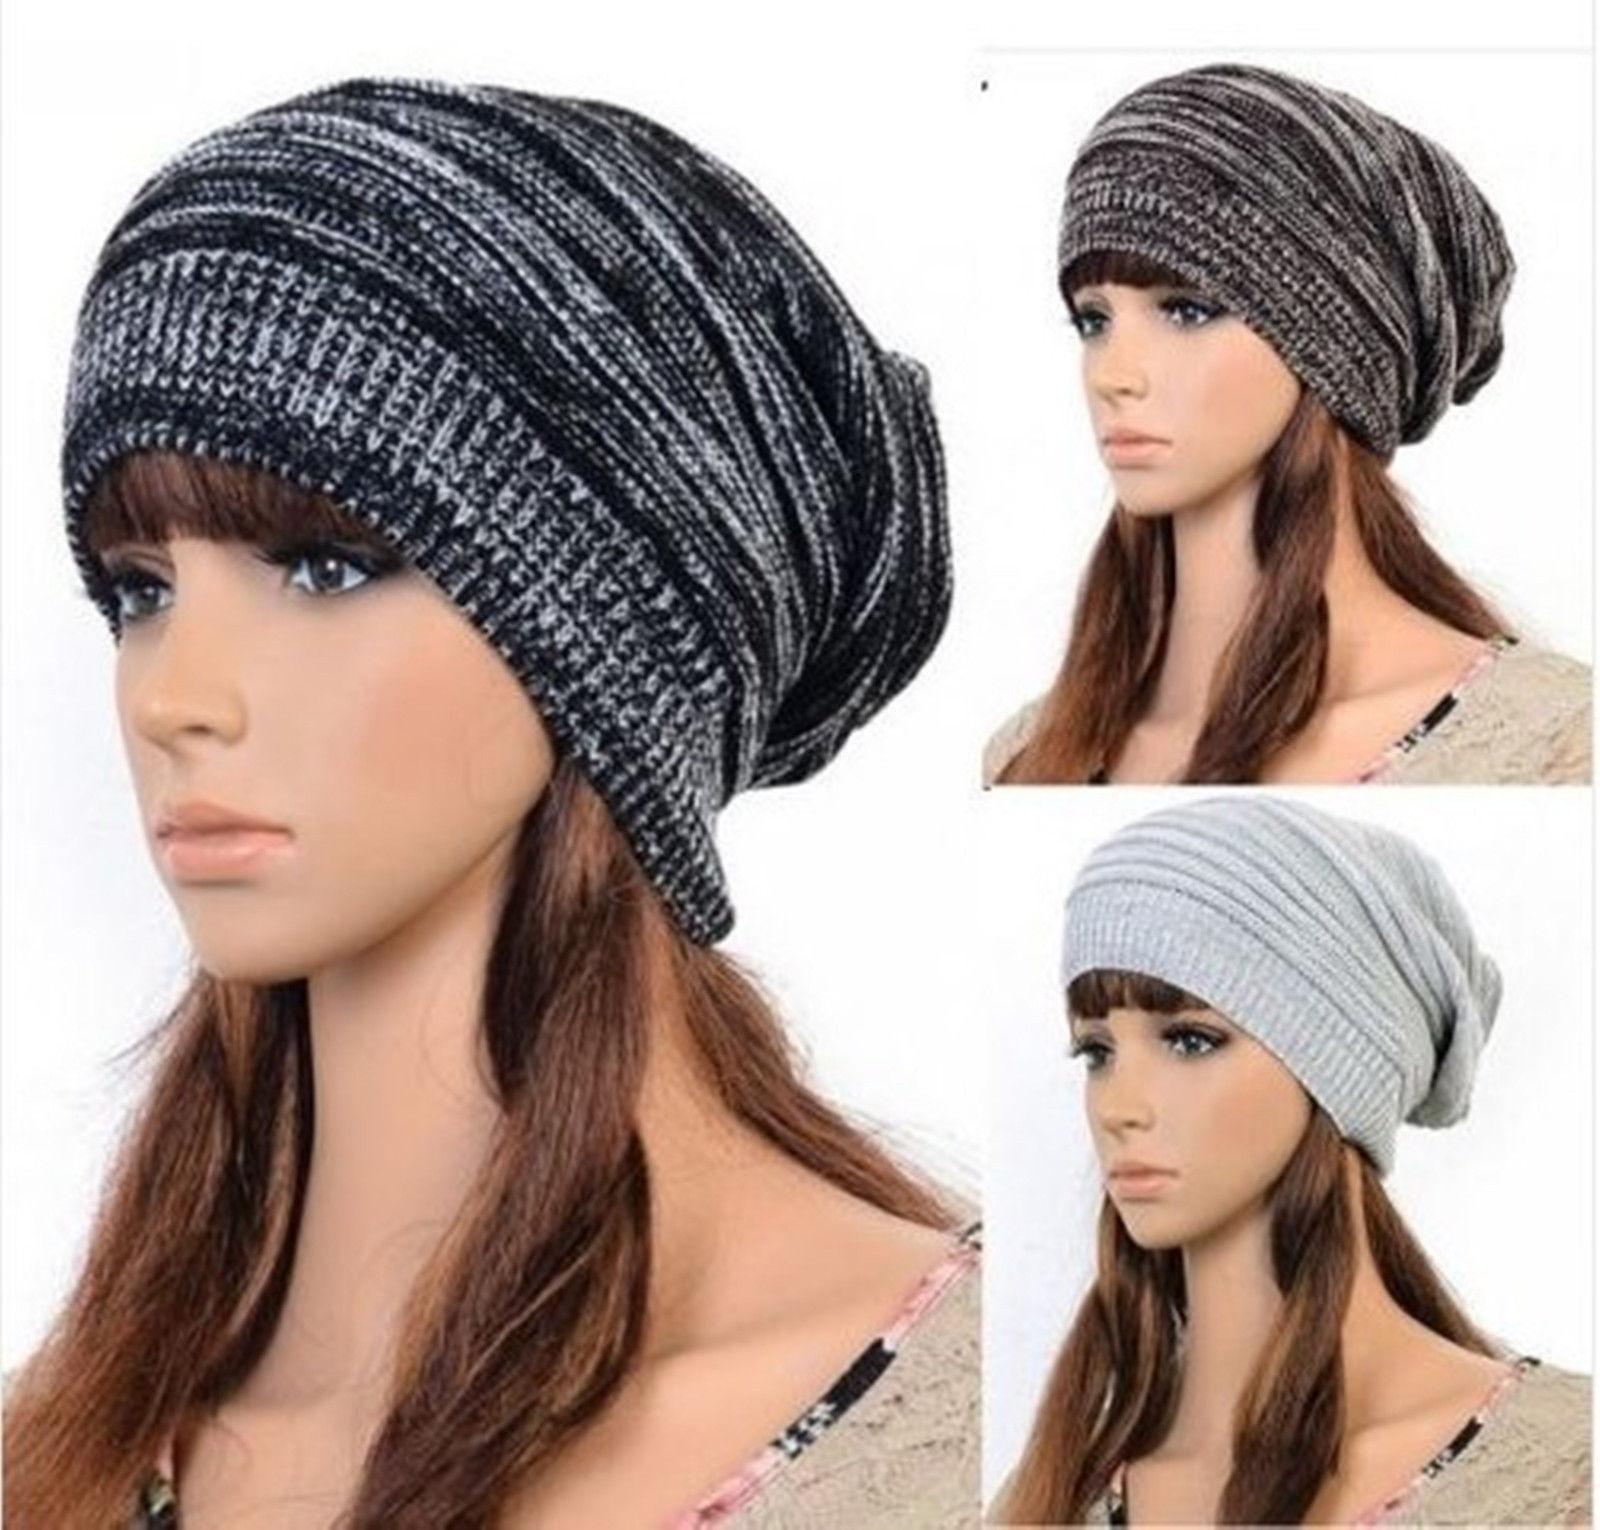 Unisex Women Men Knit Baggy Beanie Beret Winter Warm Oversized Ski Cap Hat PW